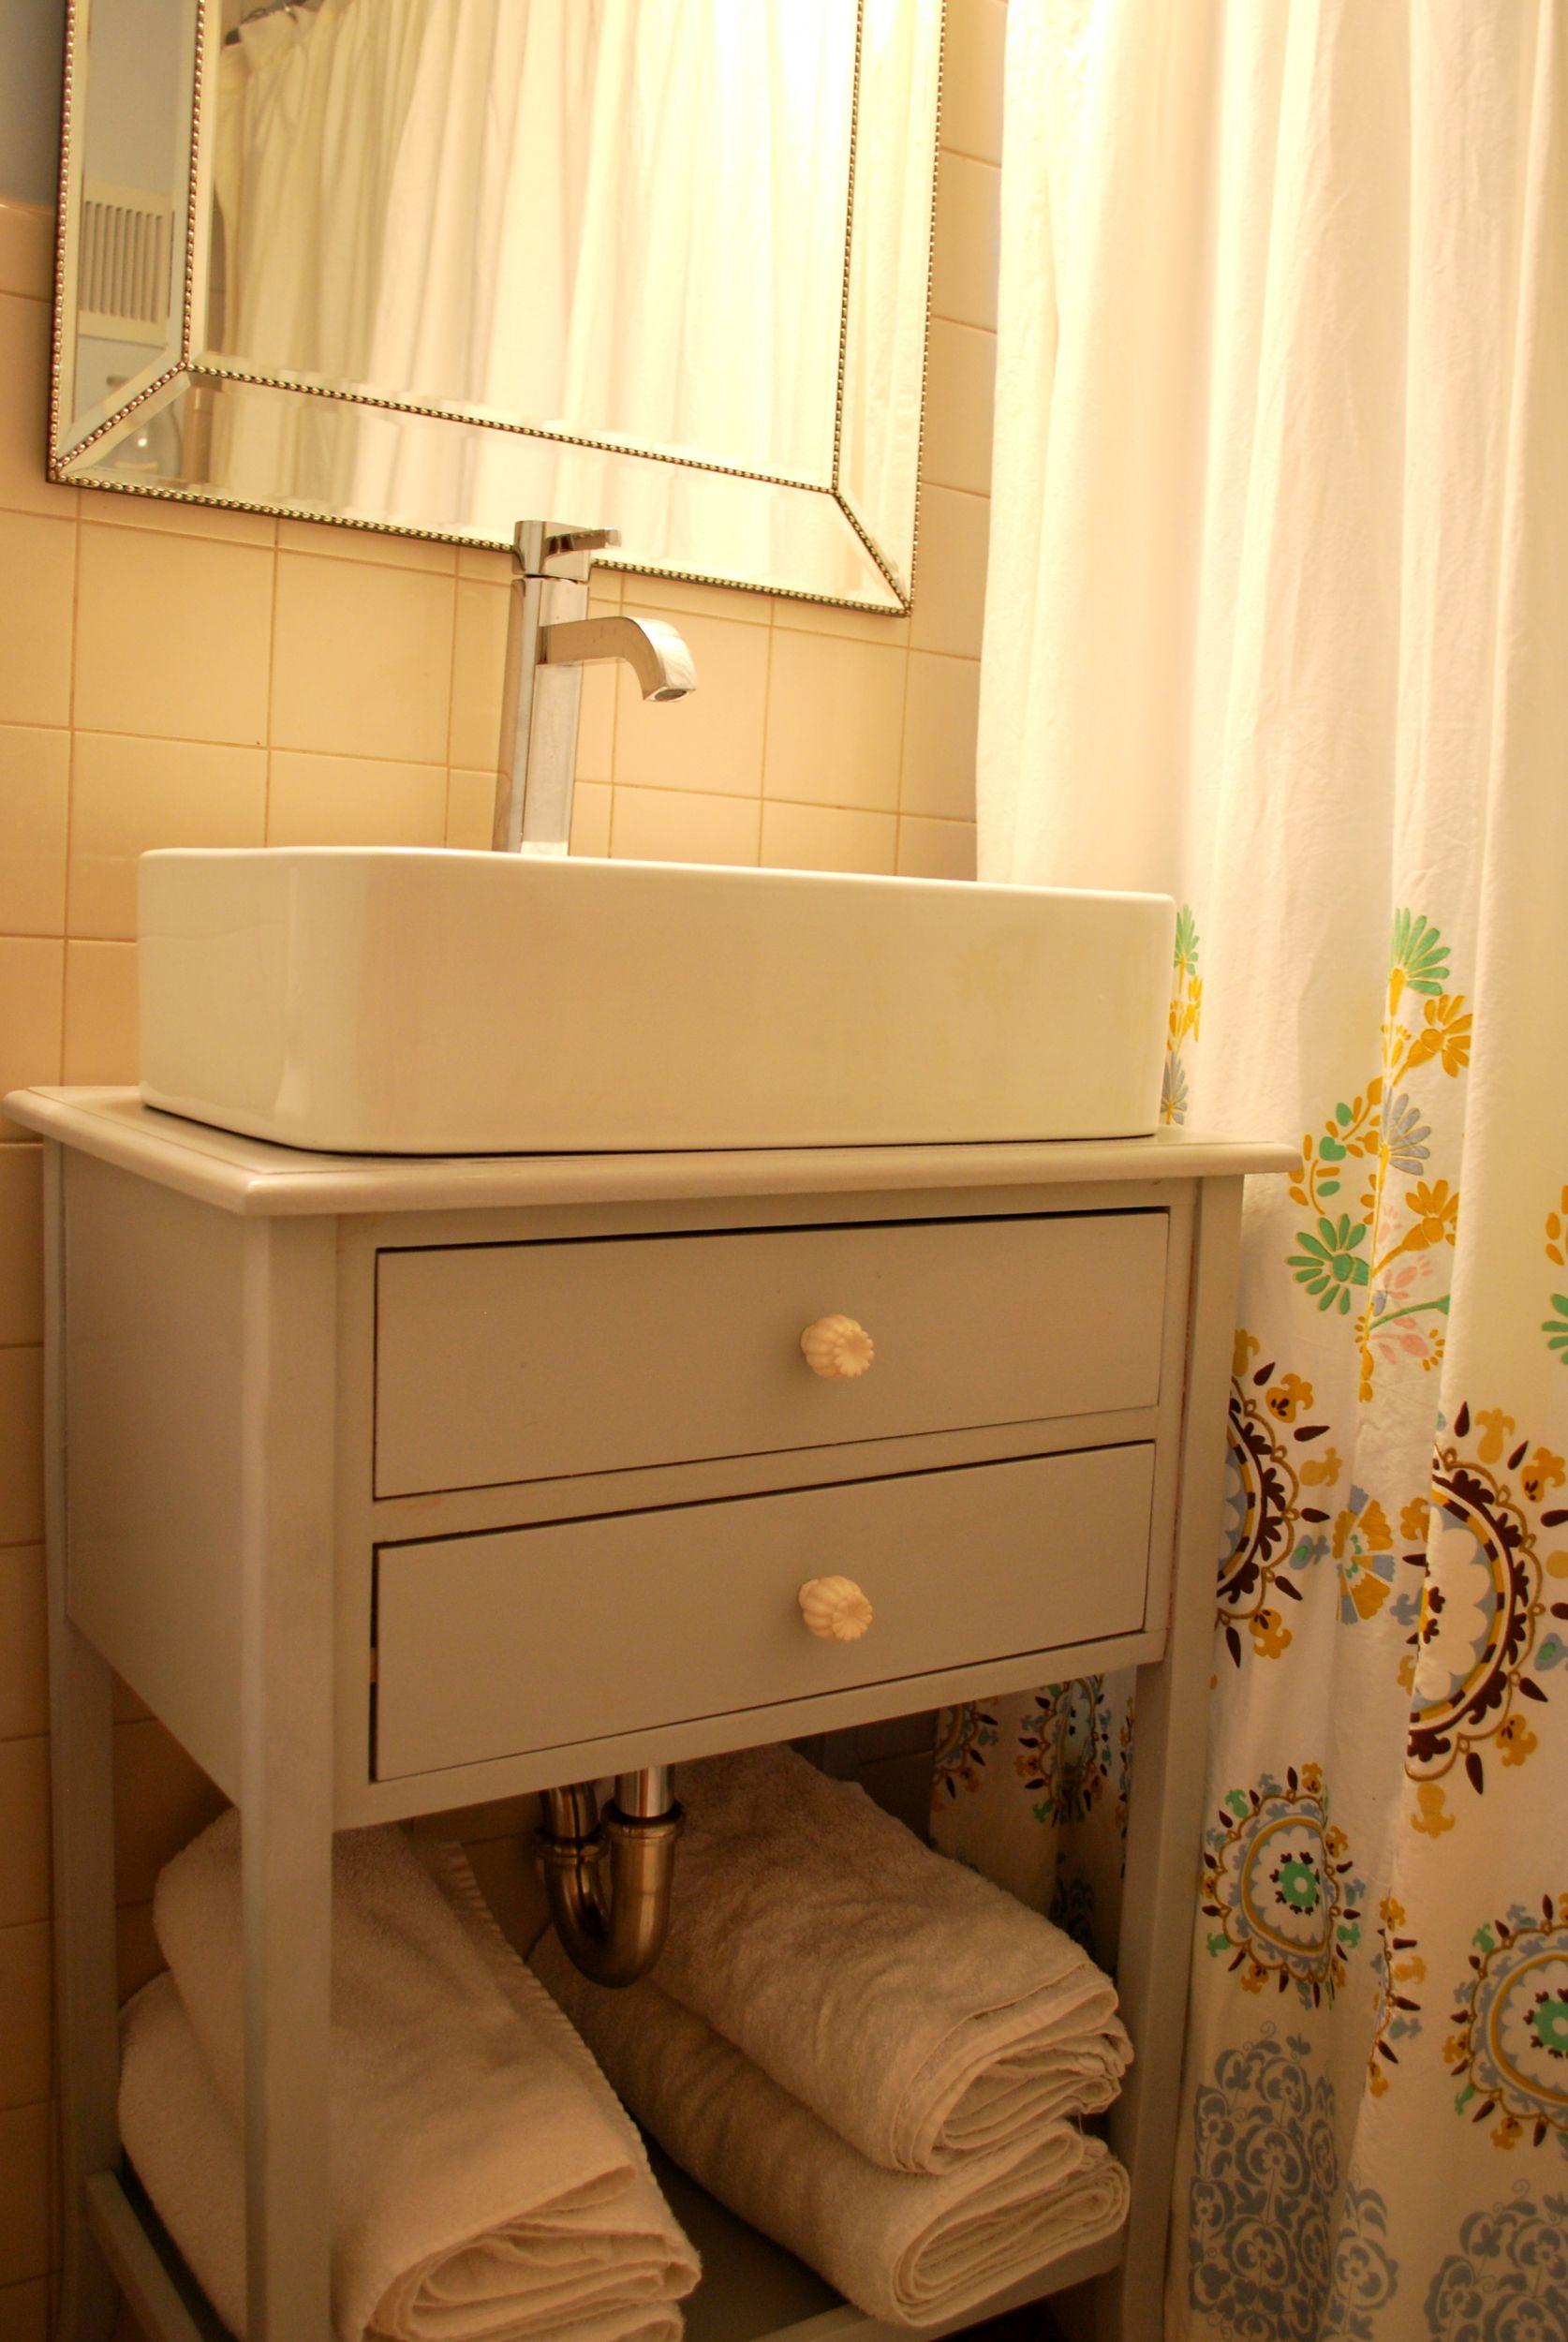 Diy Vessel Sink Cabinet The Suburban Urbanist The